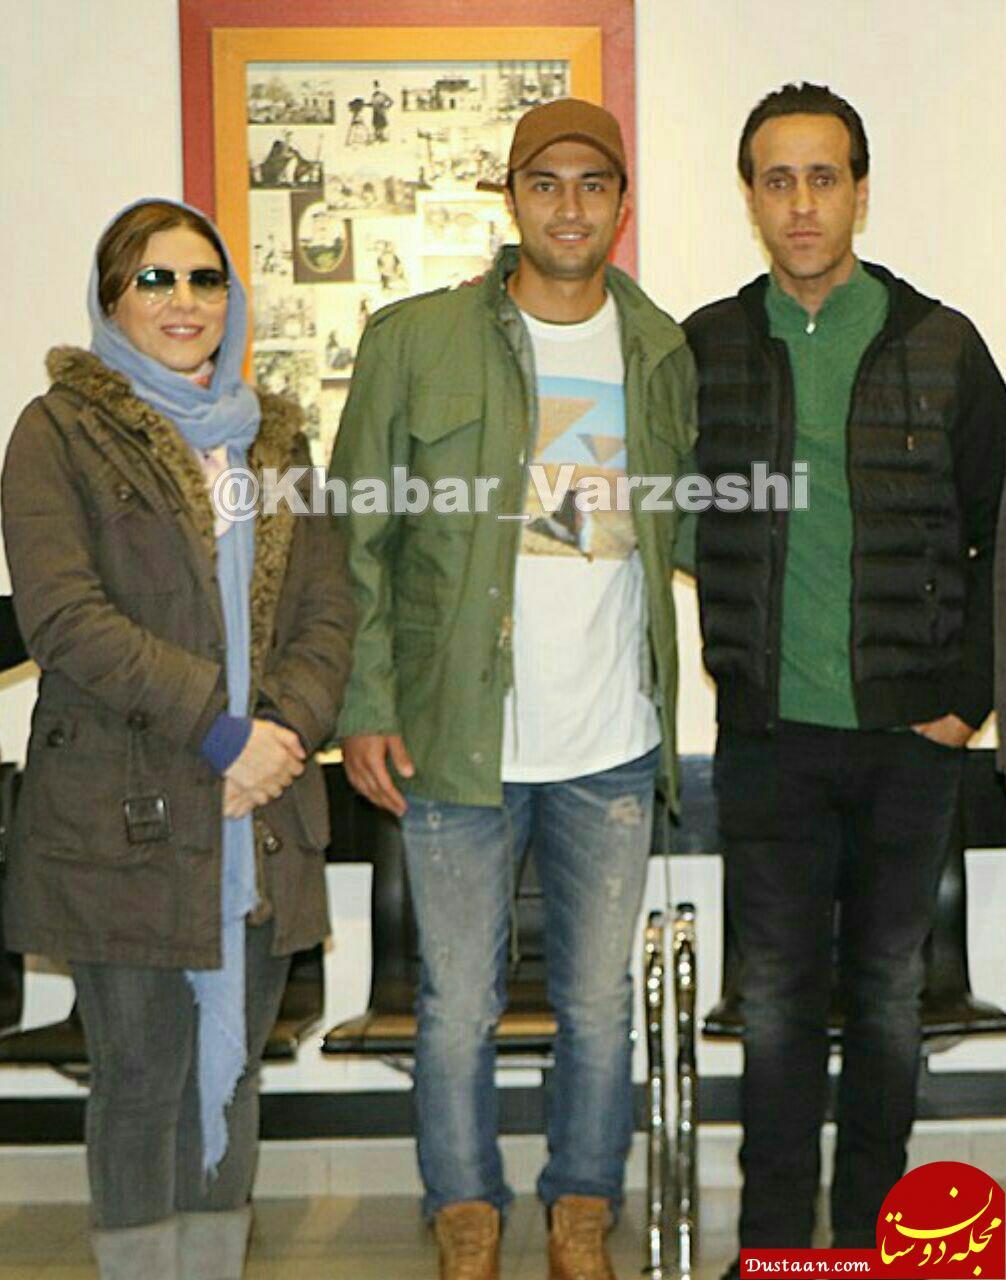 www.dustaan.com علی کریمی در کنار دو برنده سیمرغ بلورین جشنواره! +عکس